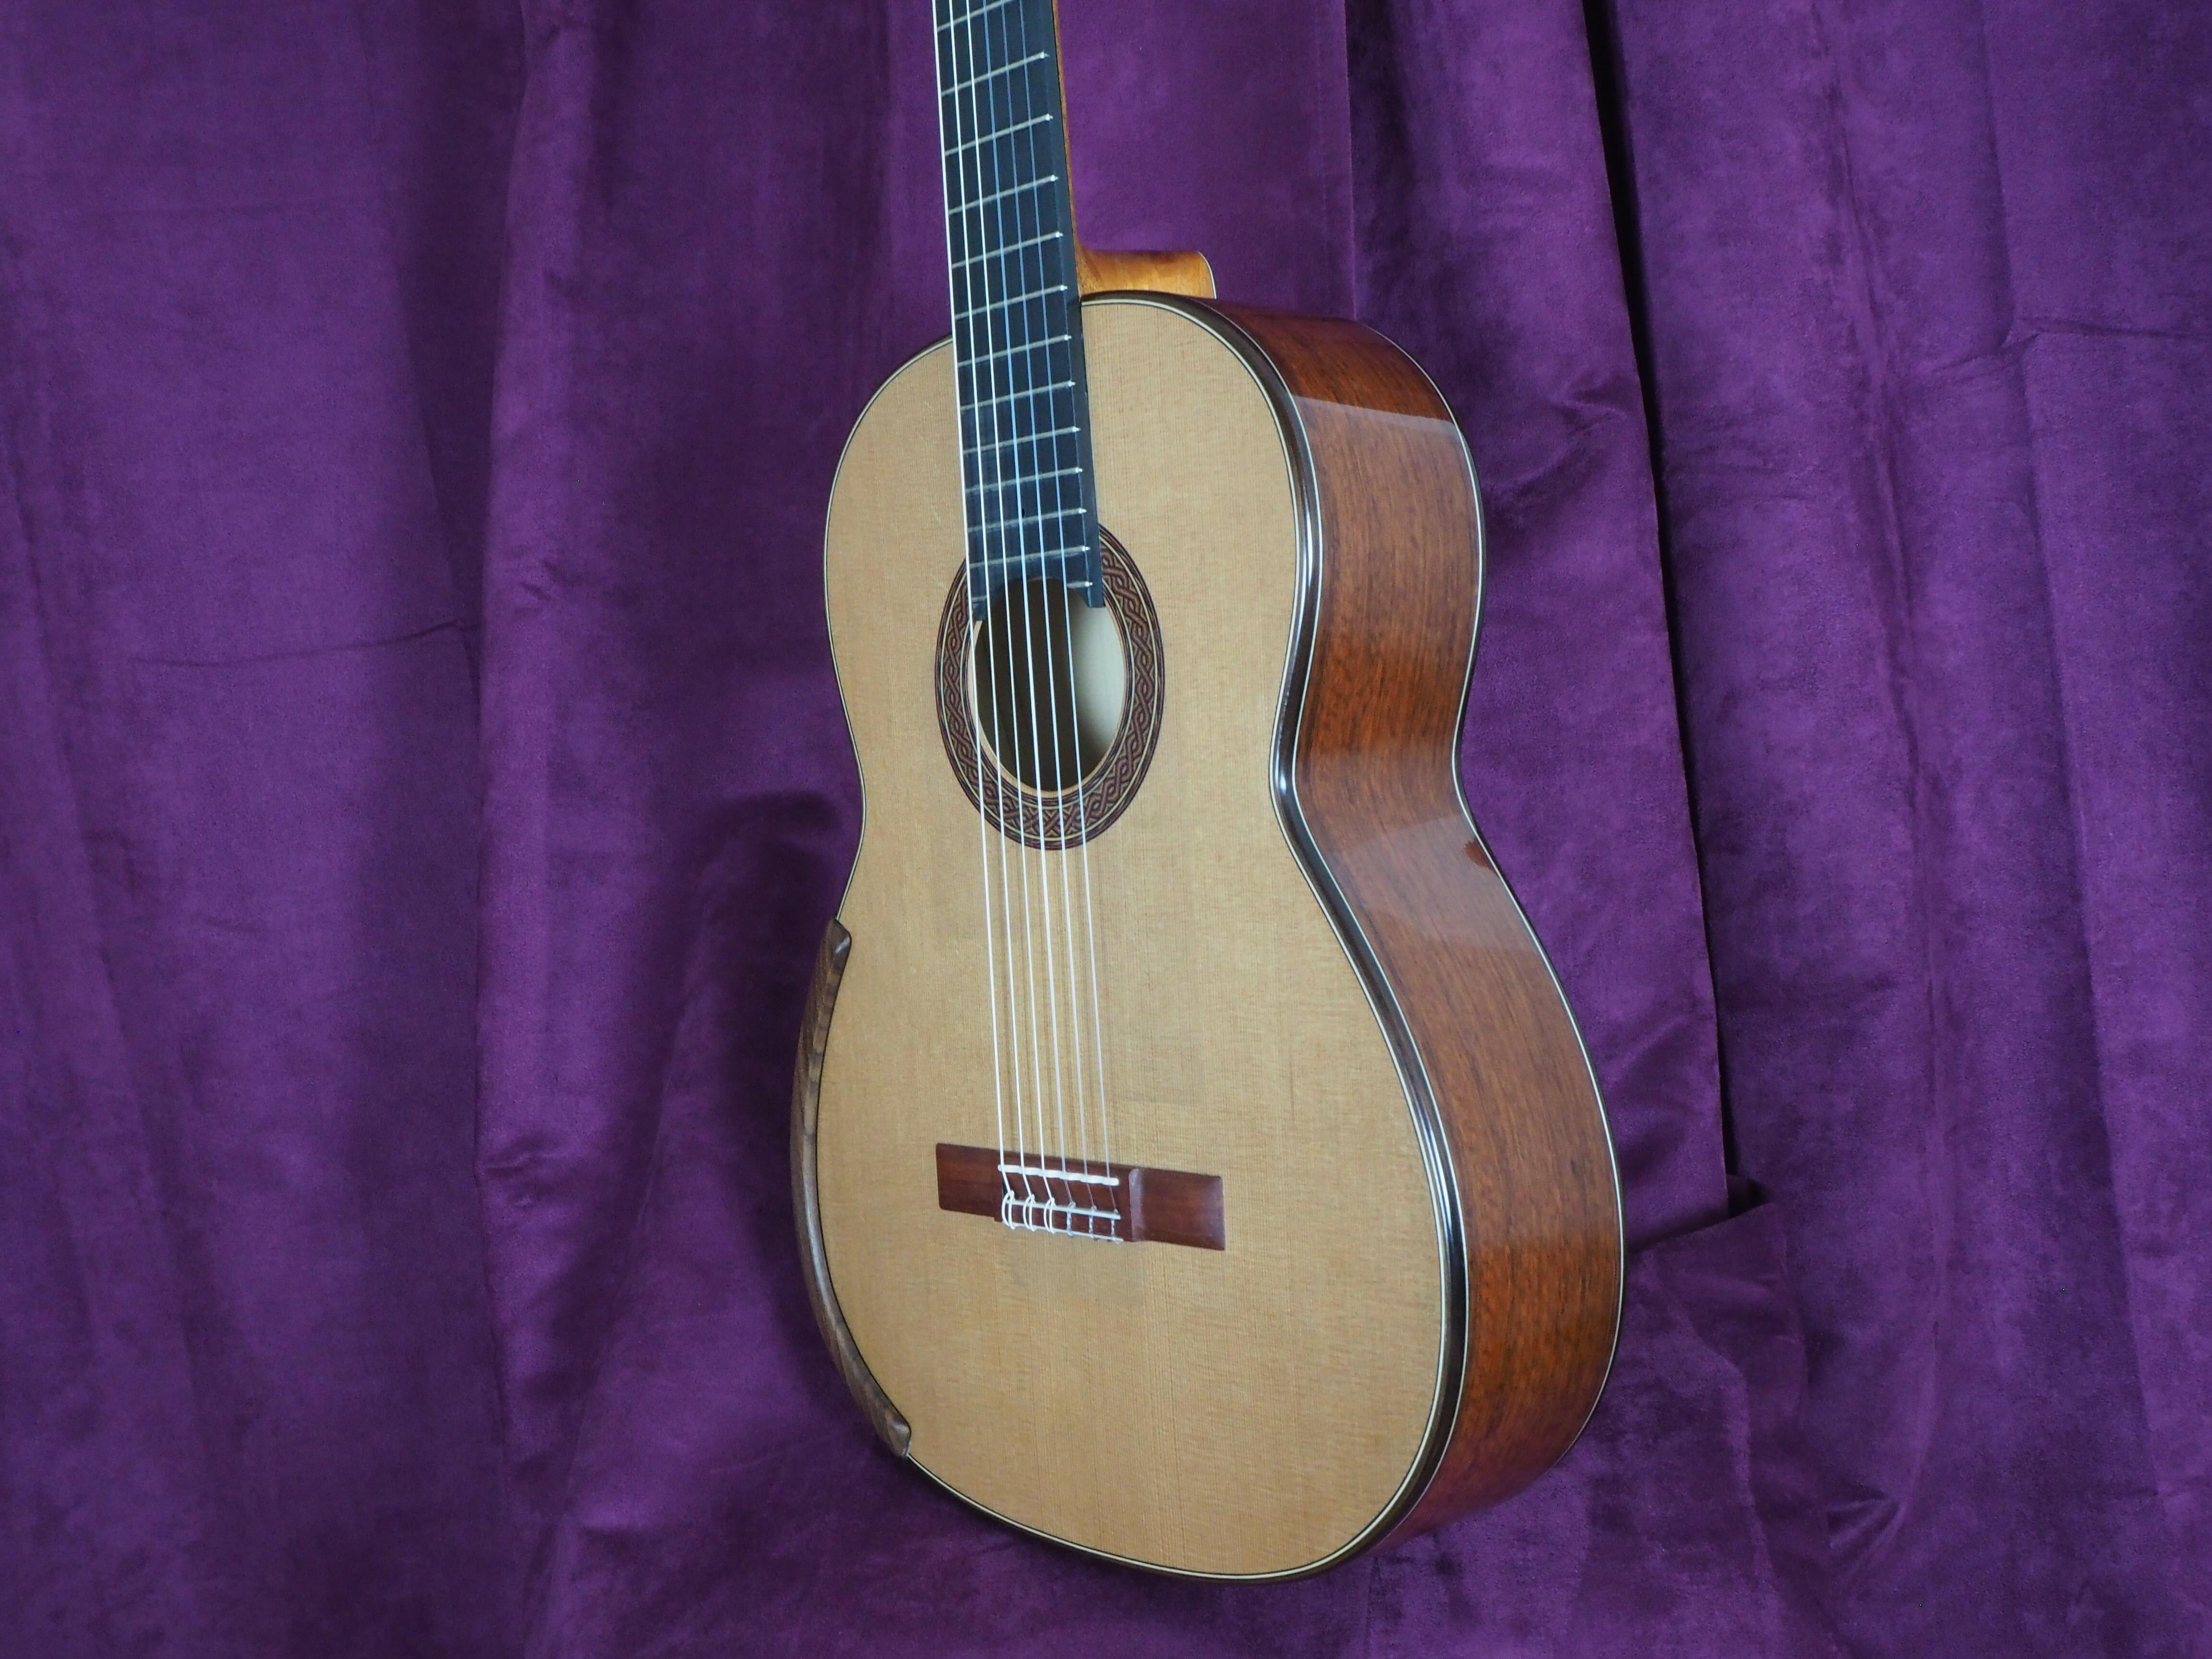 Greg Smallman 2014 guitare classique luthier lattice